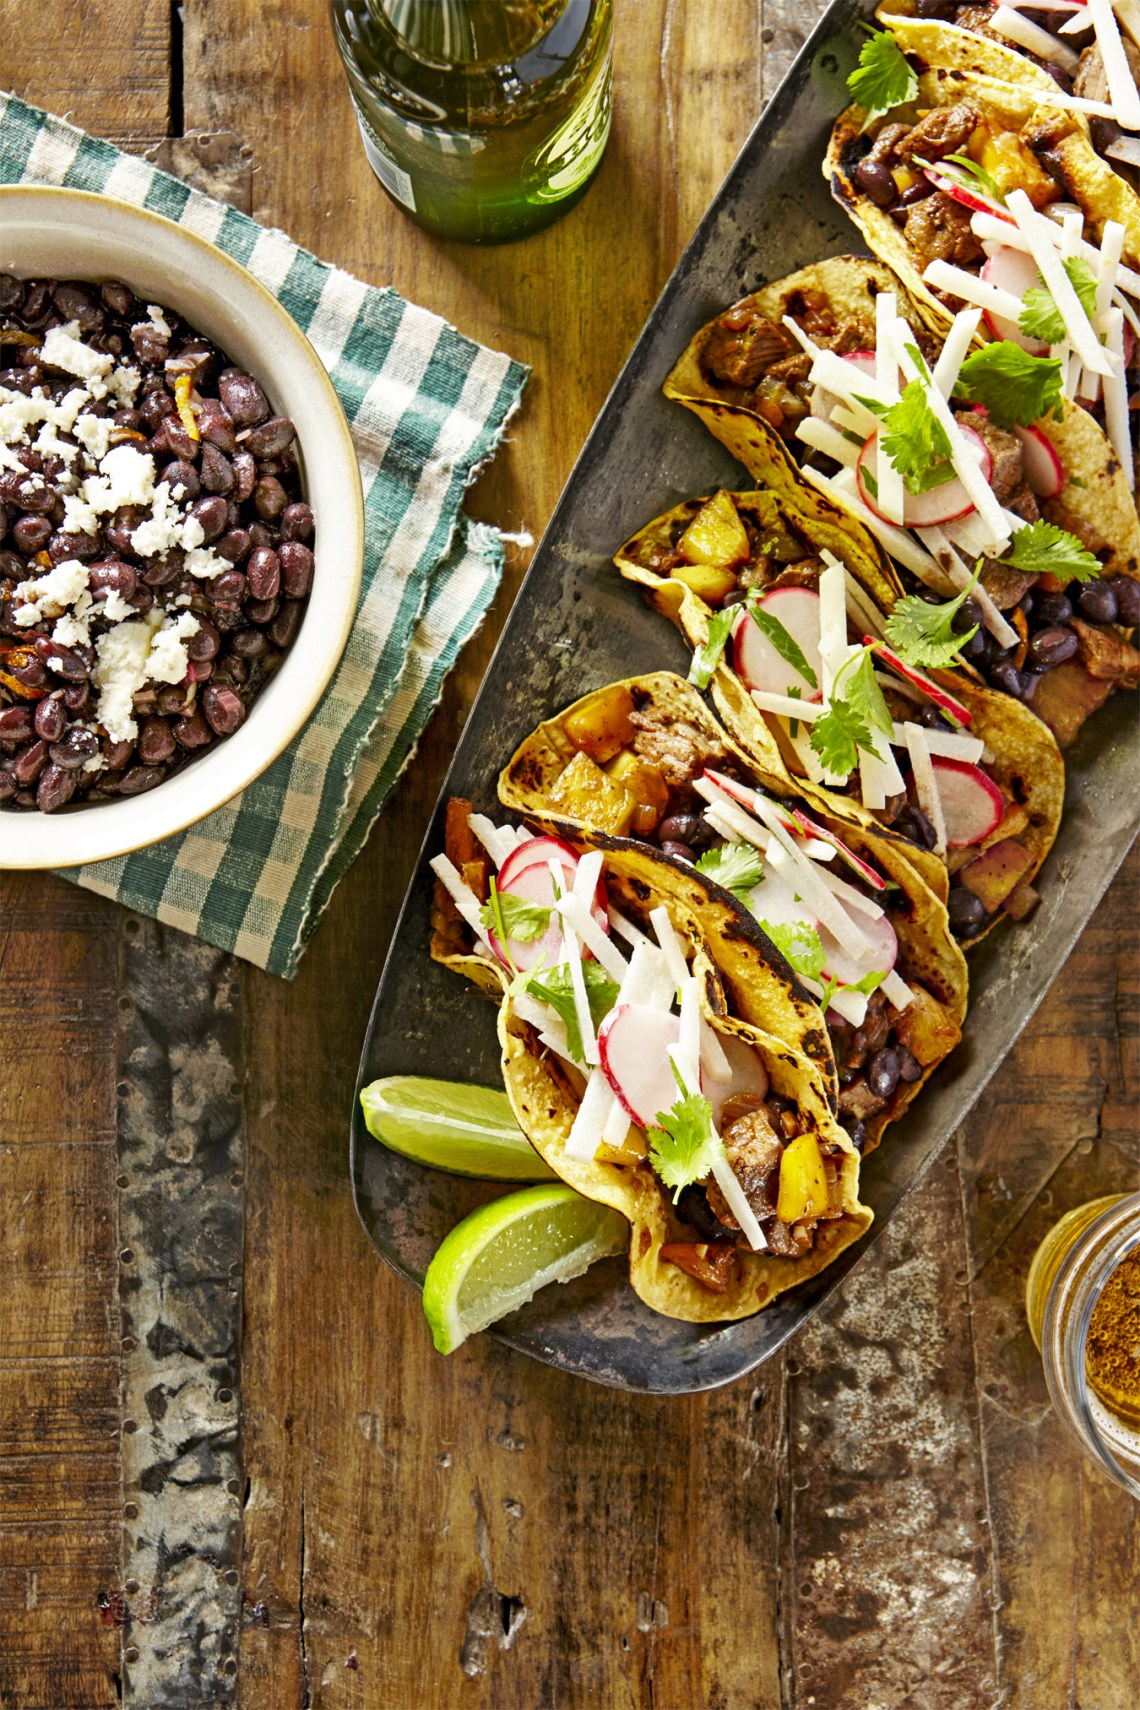 50+ Best Ground Beef Recipes - Dinner Ideas With Ground Beef